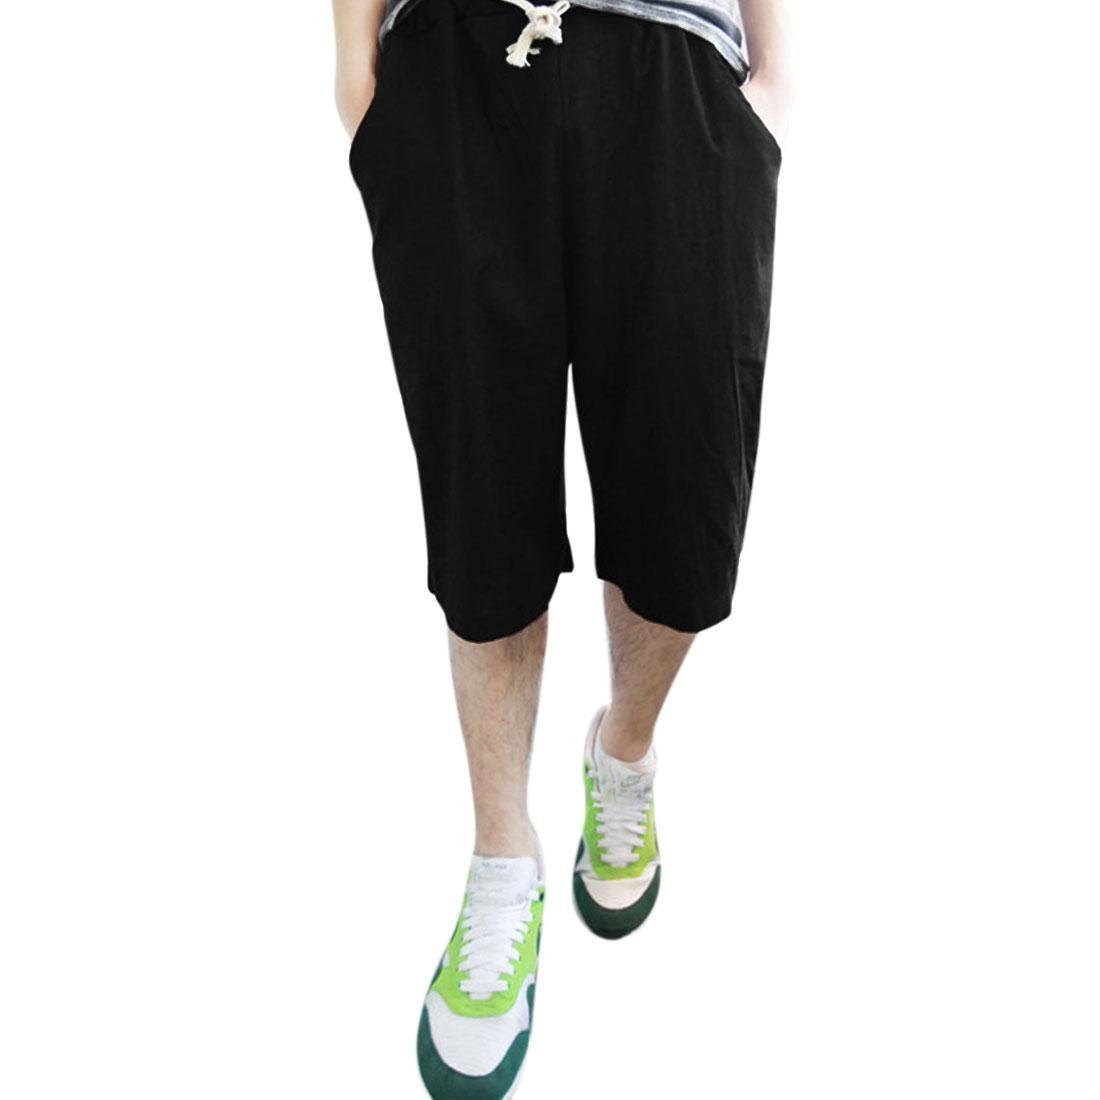 Man Slant Pockets Flax Stylish Thigh High Summer Pants Black W27